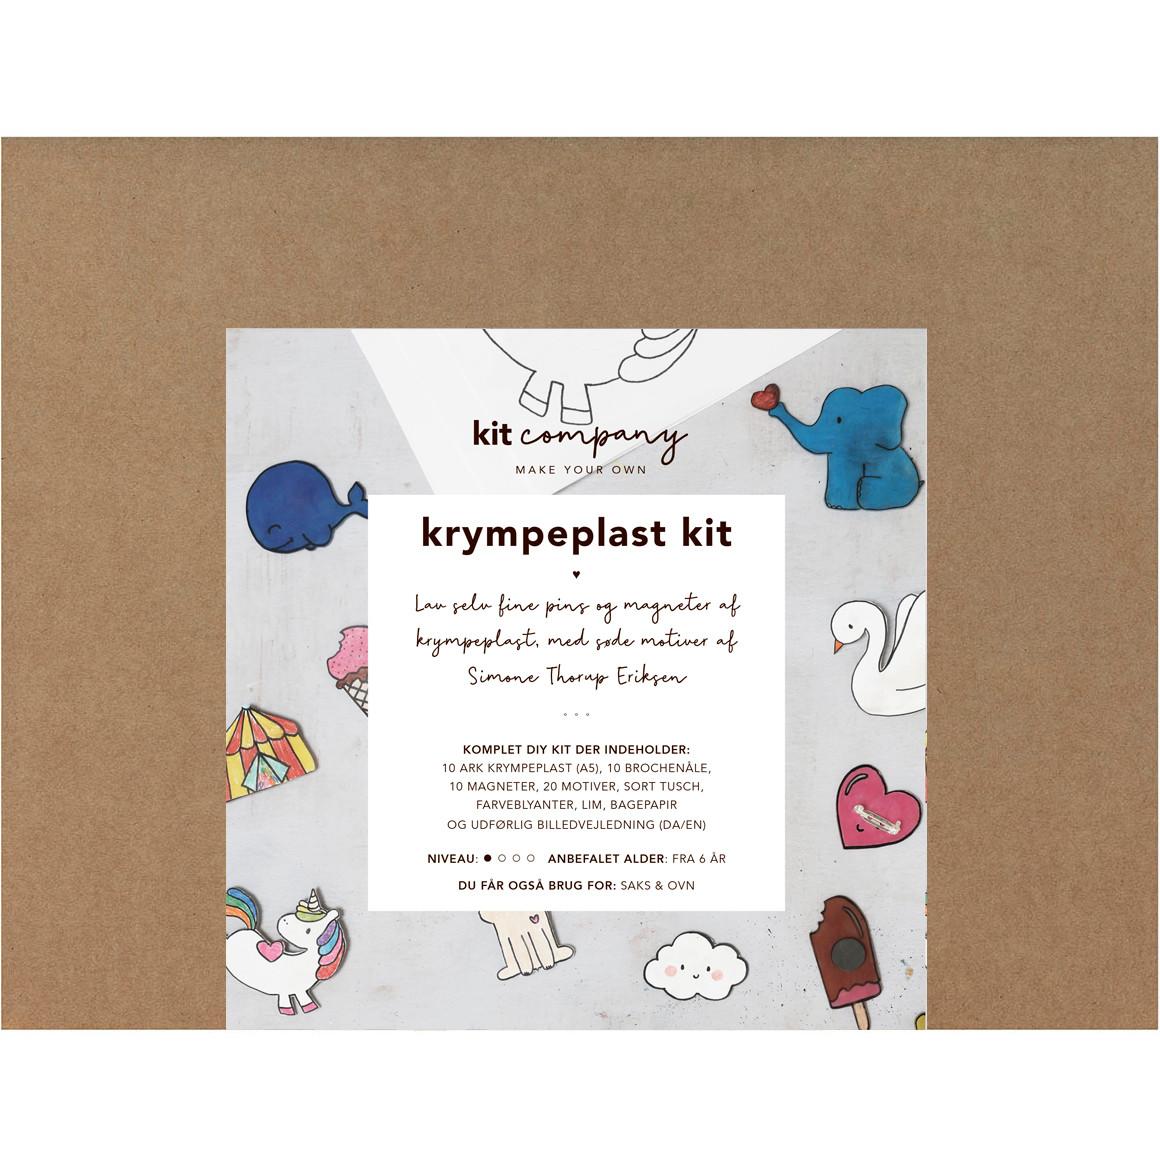 Kit Company Krympeplast Kit